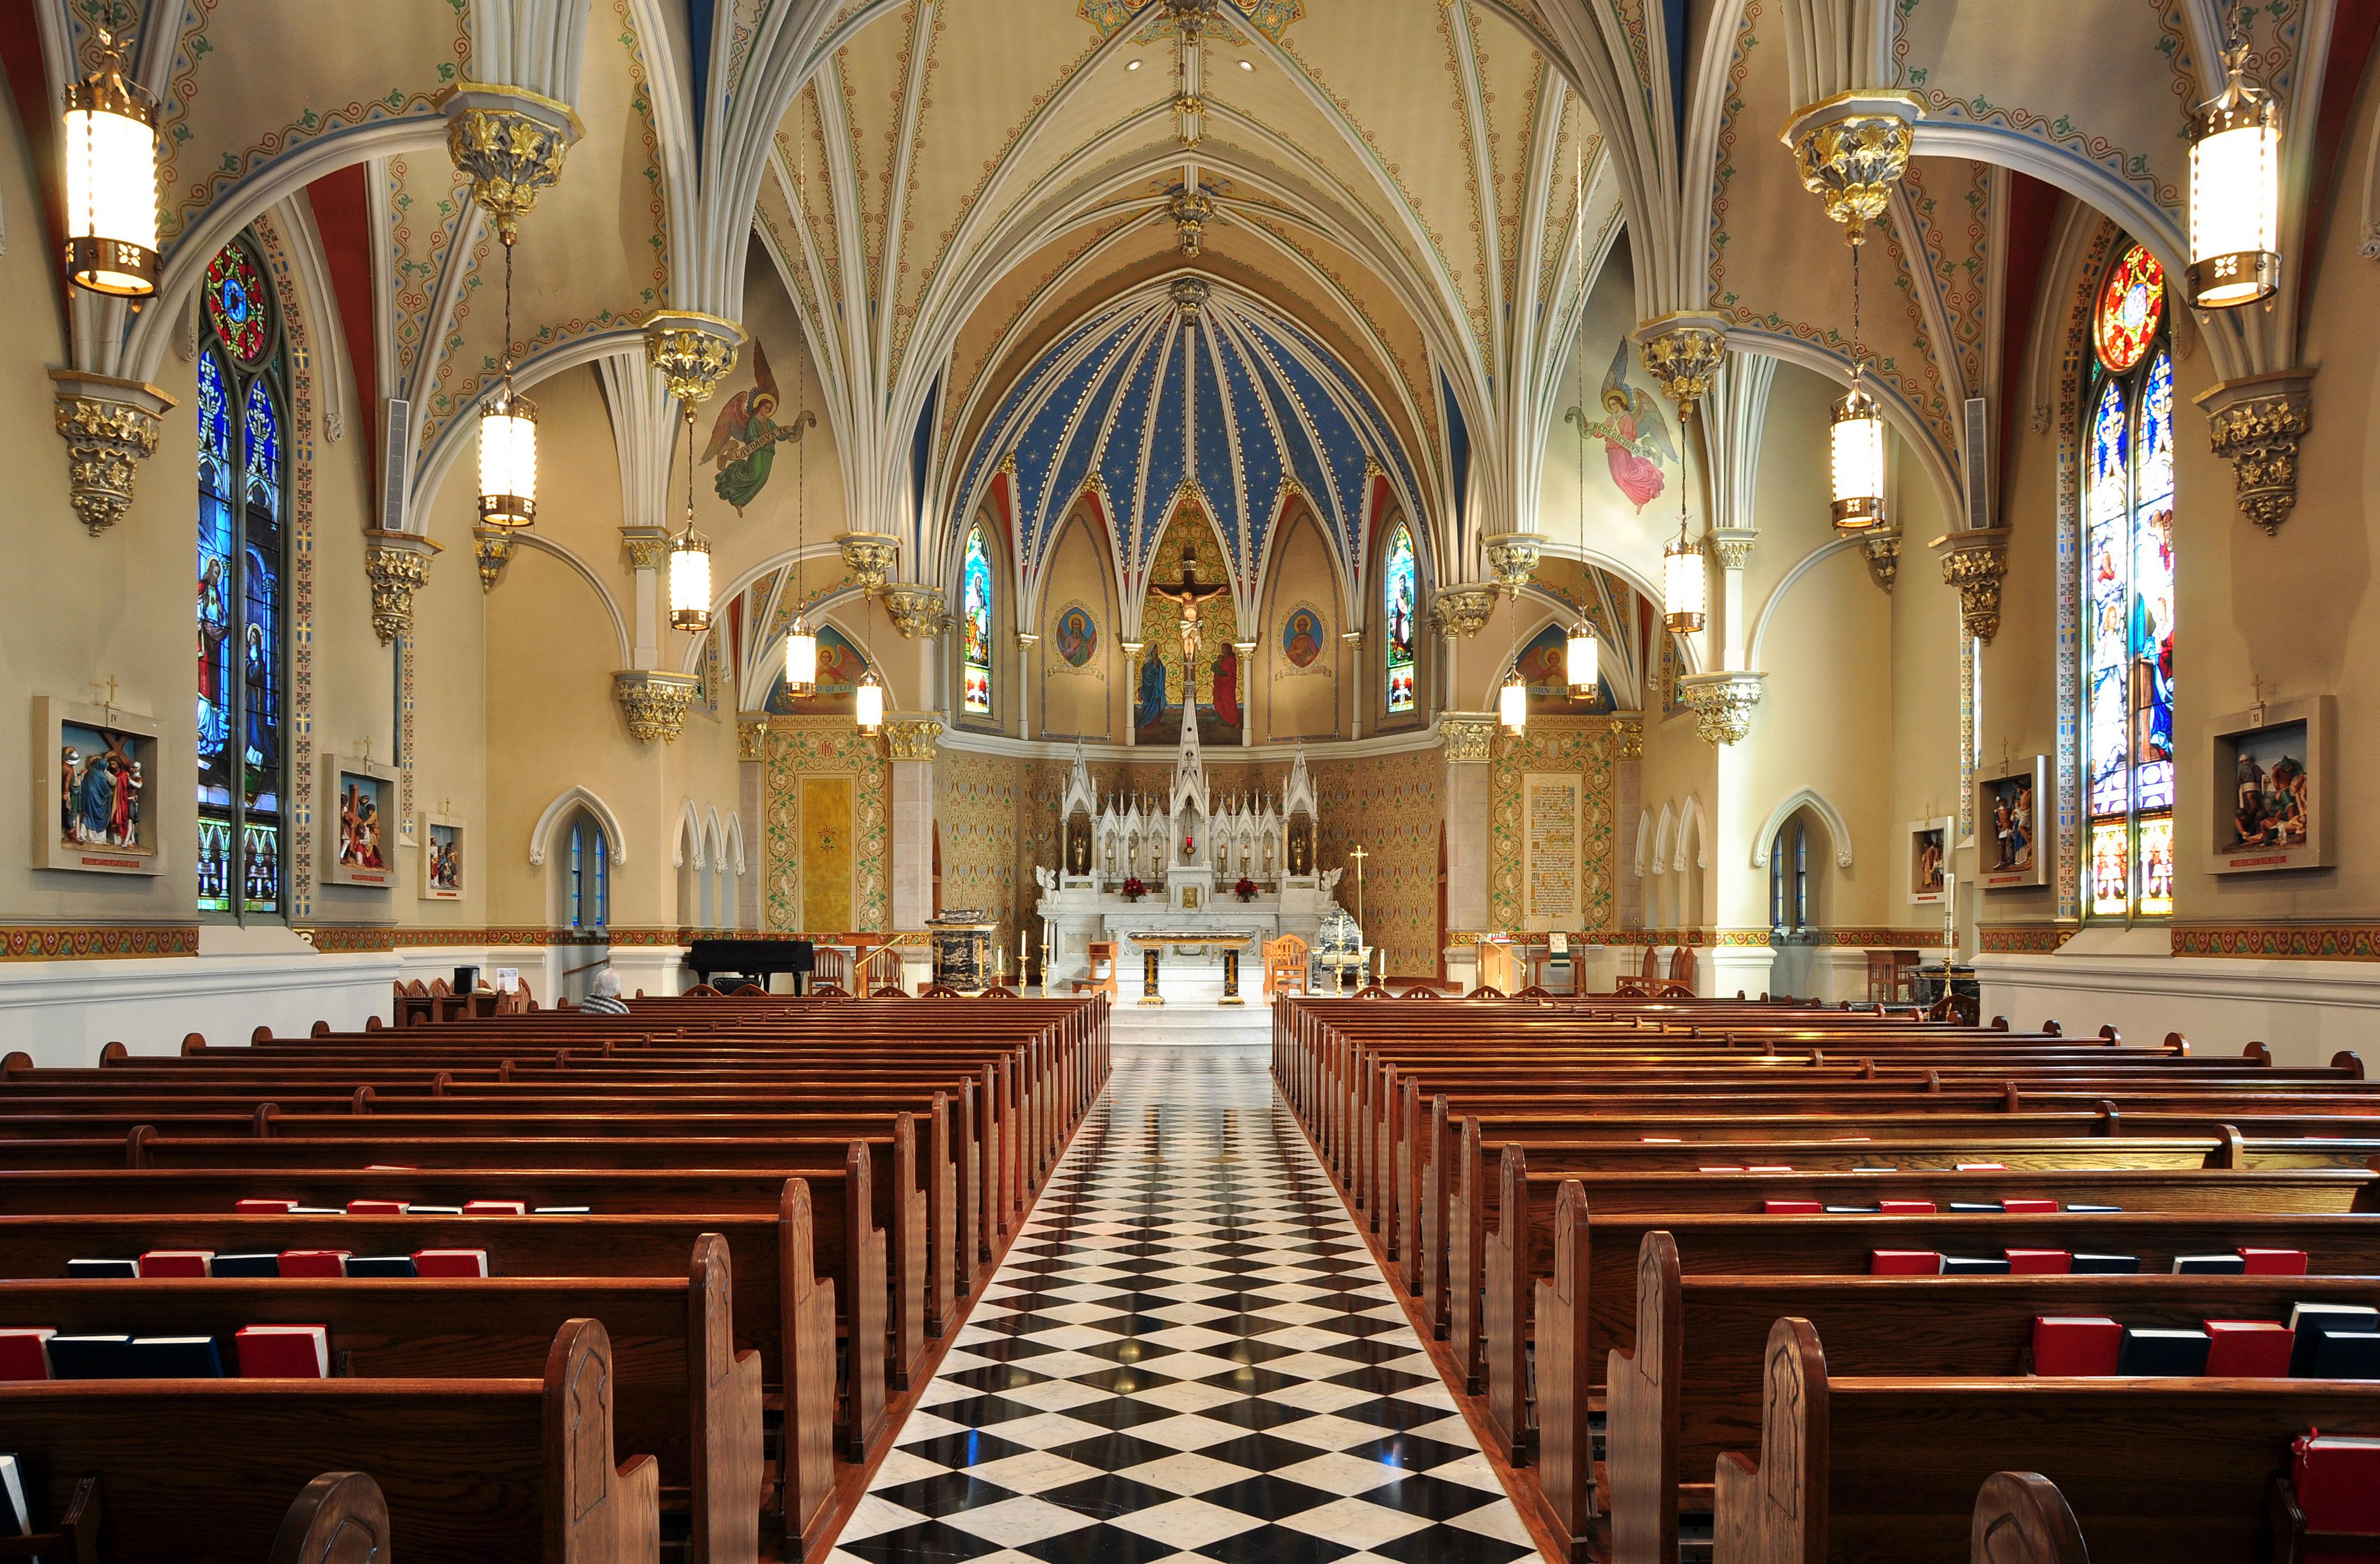 File:Interior of St Andrew's Catholic Church in Roanoke ...